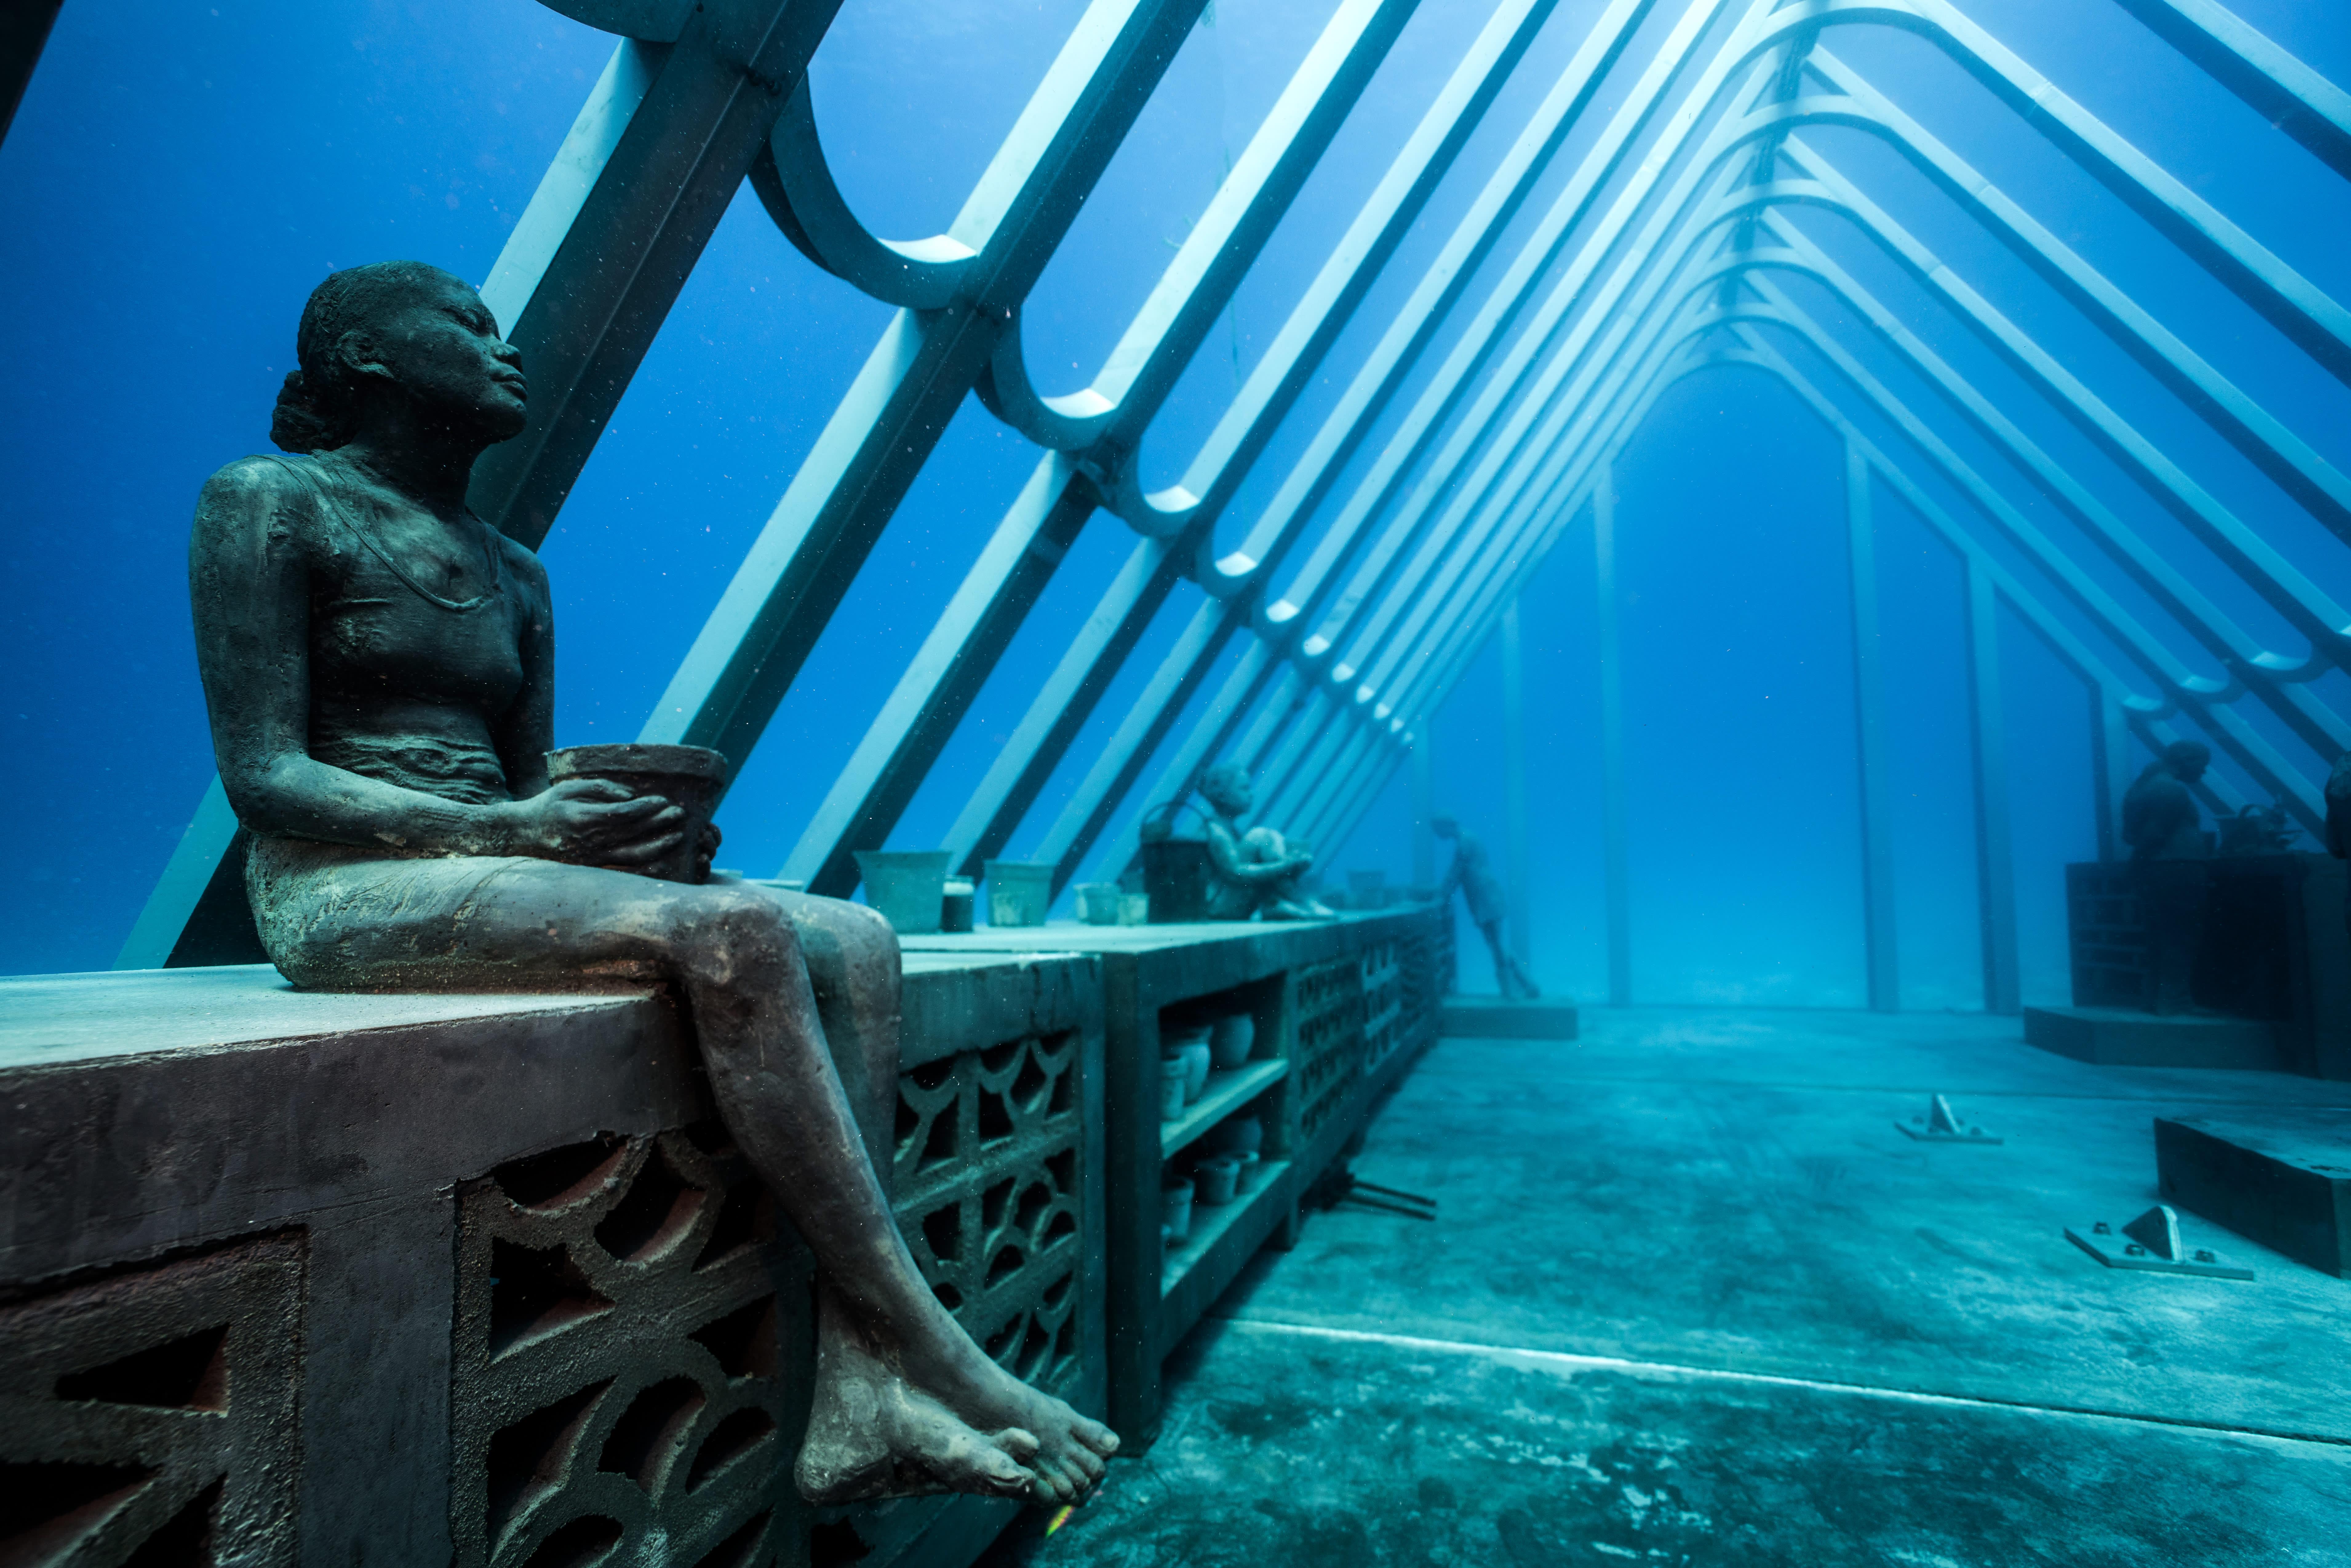 Museum of Underwater Art to open inside Australia's Great Barrier Reef